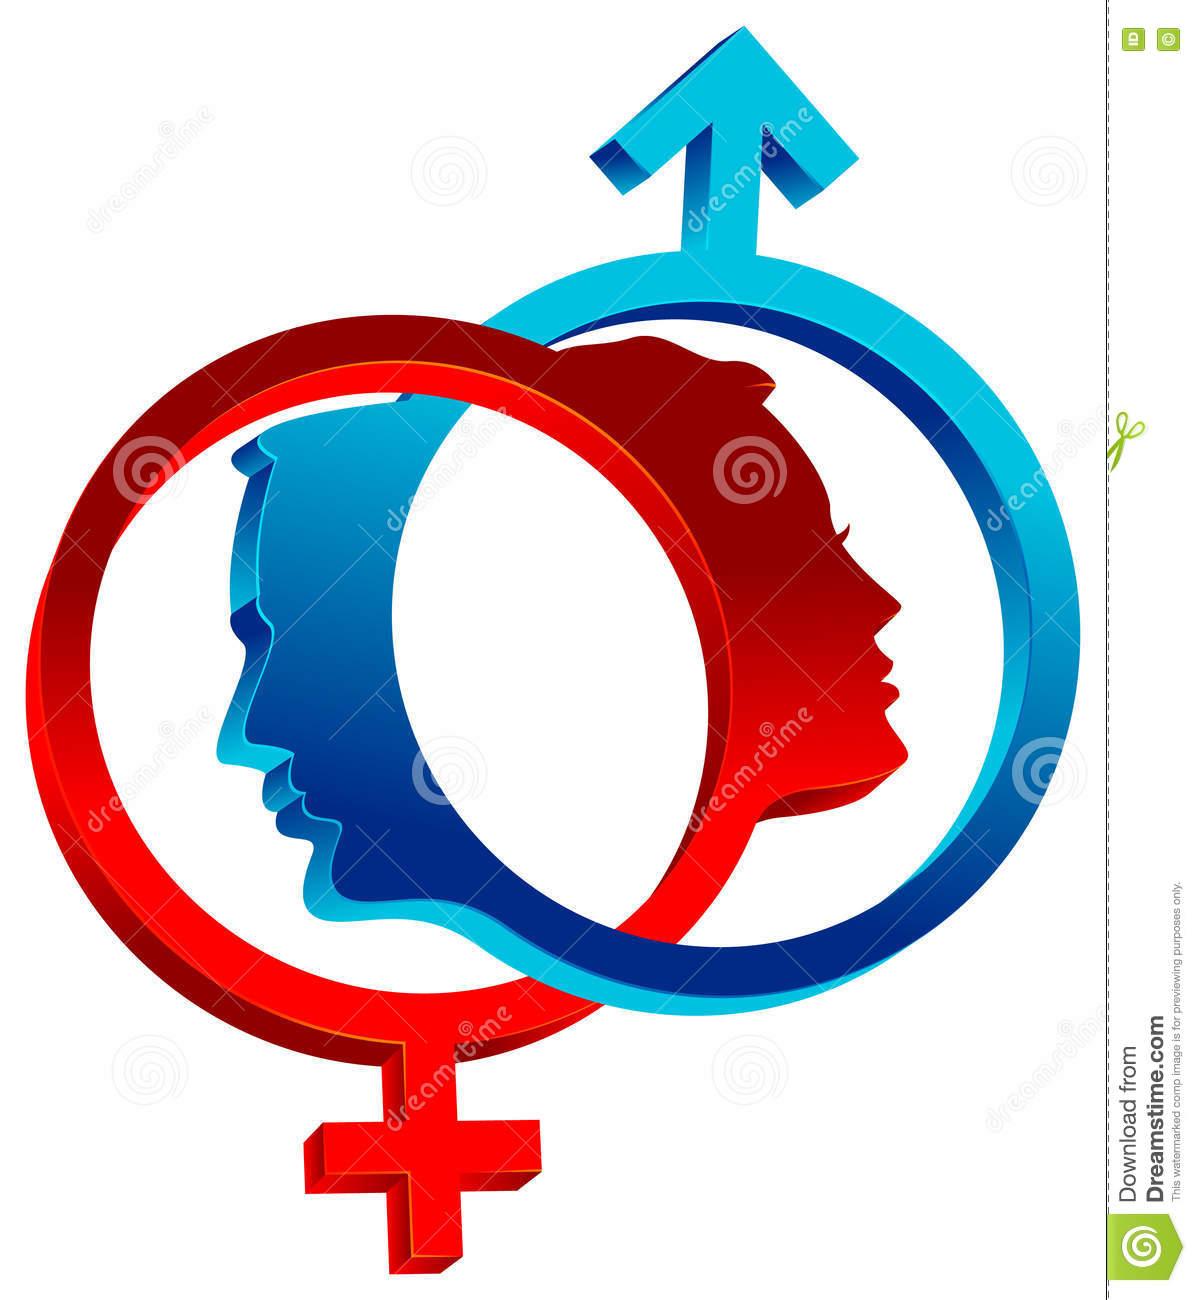 Linked Sex Symbols Stock Illustration.